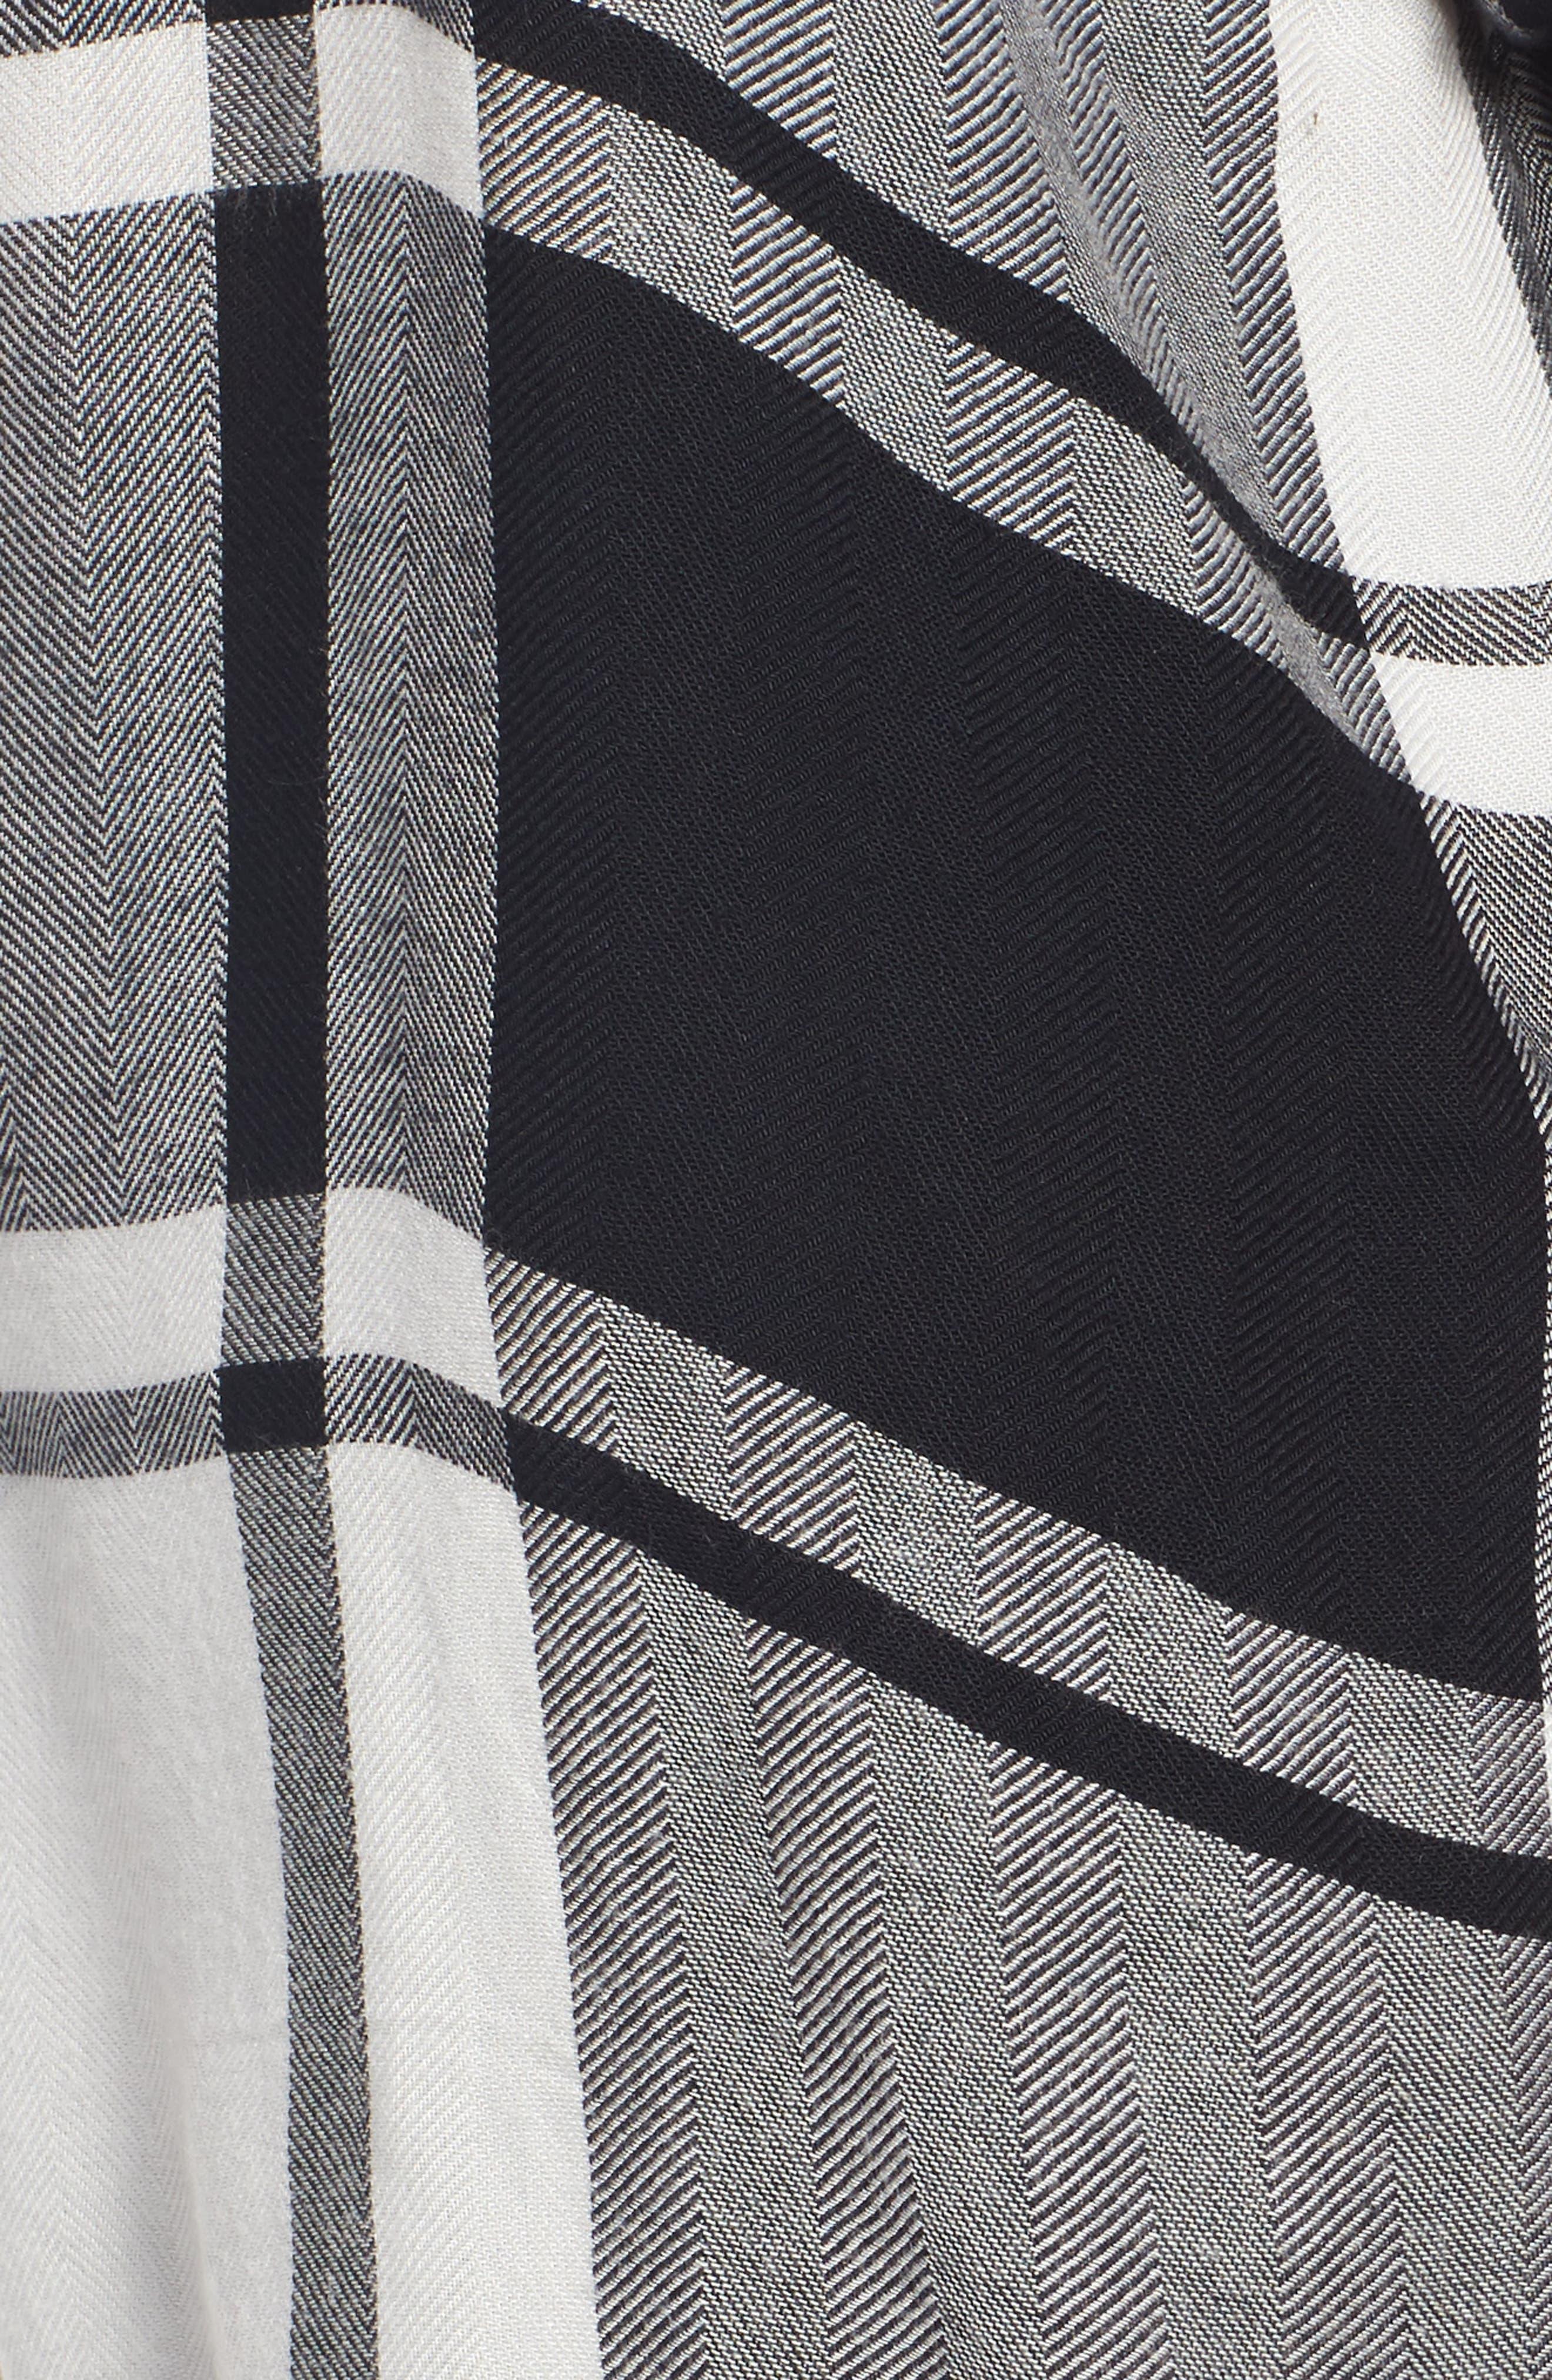 Oversized Plaid Tunic,                             Alternate thumbnail 5, color,                             001